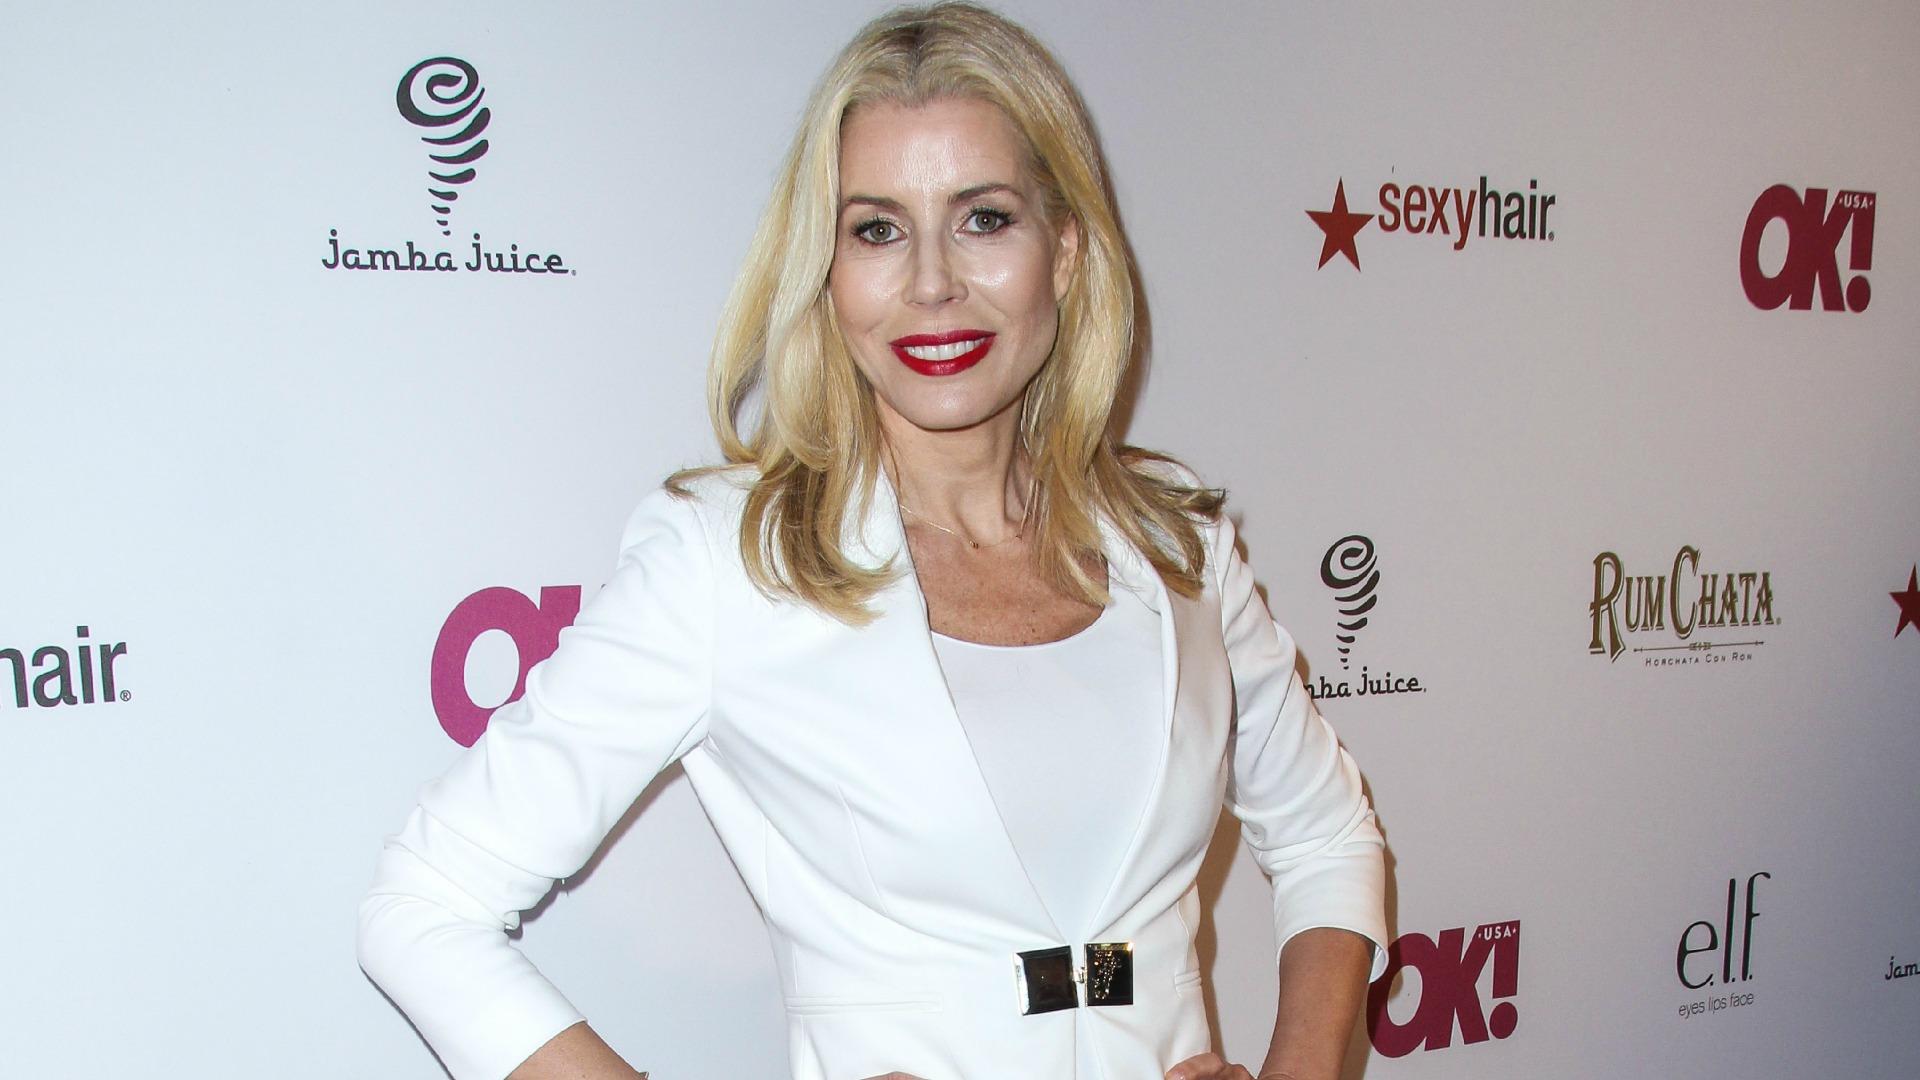 Aviva Drescher hurls more than just insults: Star throws fake leg at housewives